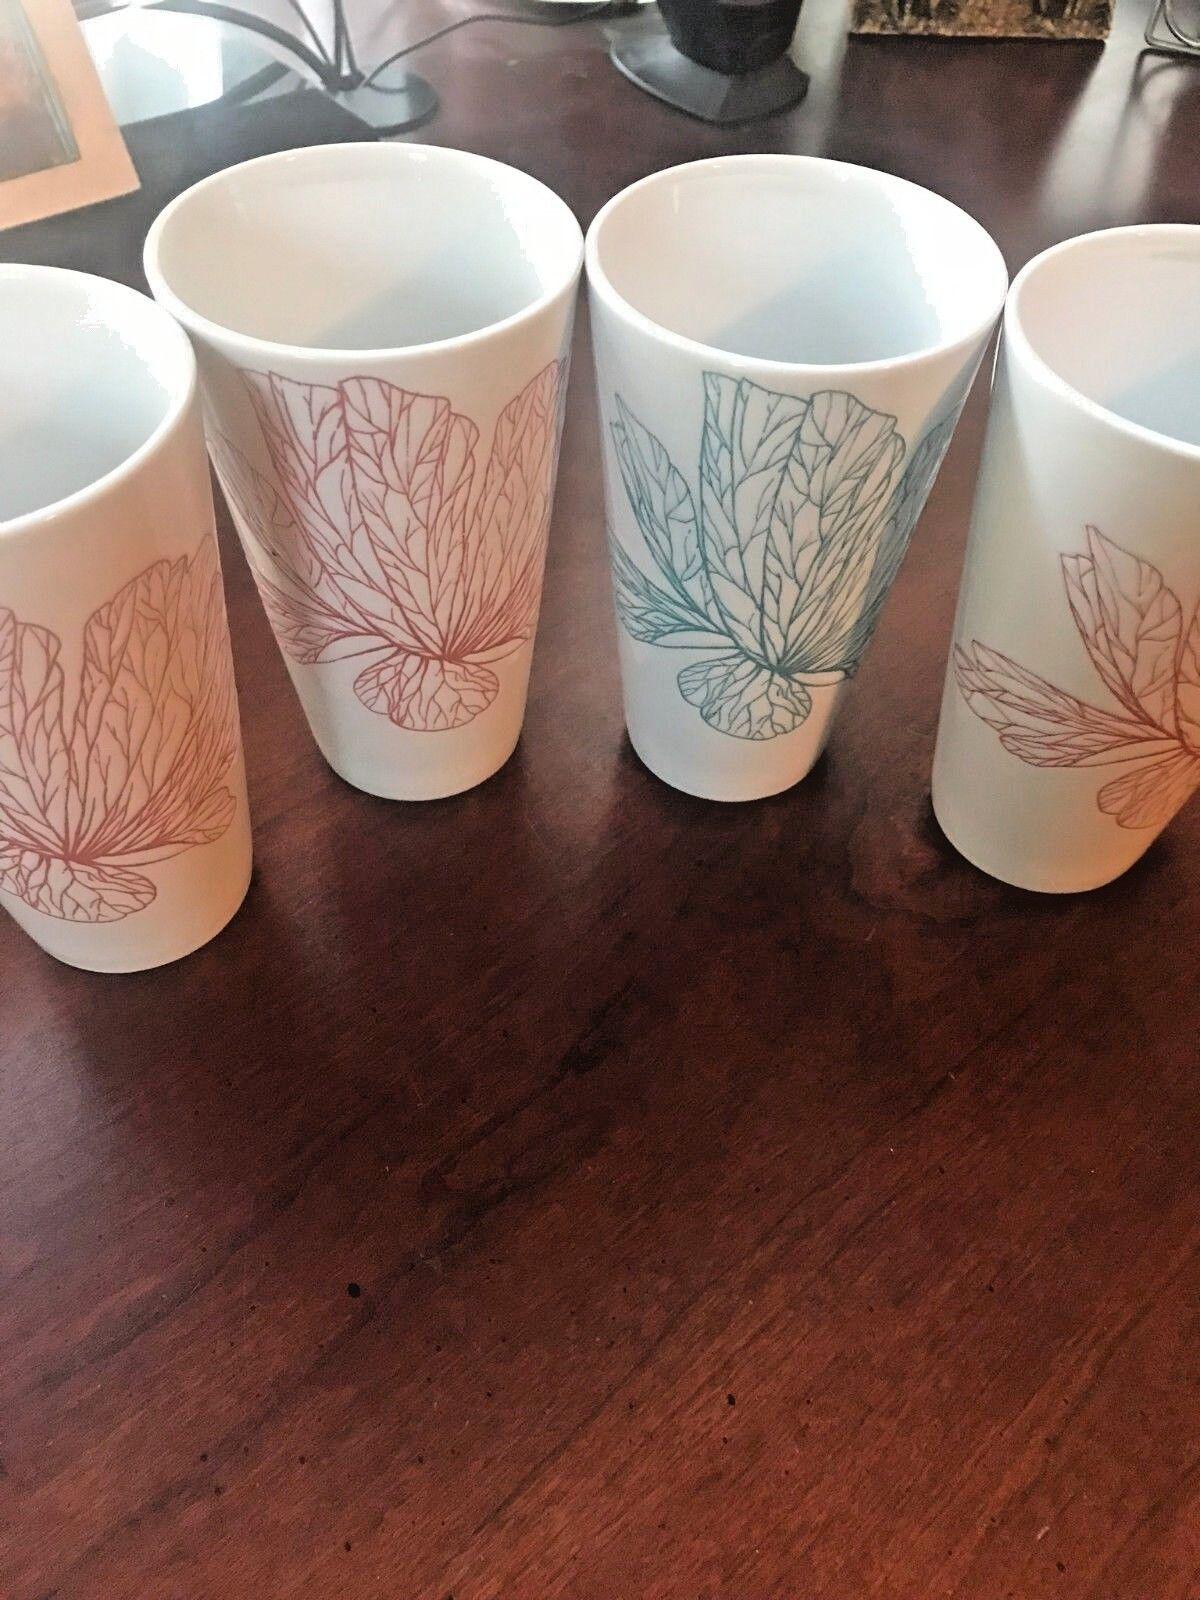 WORLD MARKET White with 1 flower 16 oz Ceramic Coffee Mug Cup set of 4